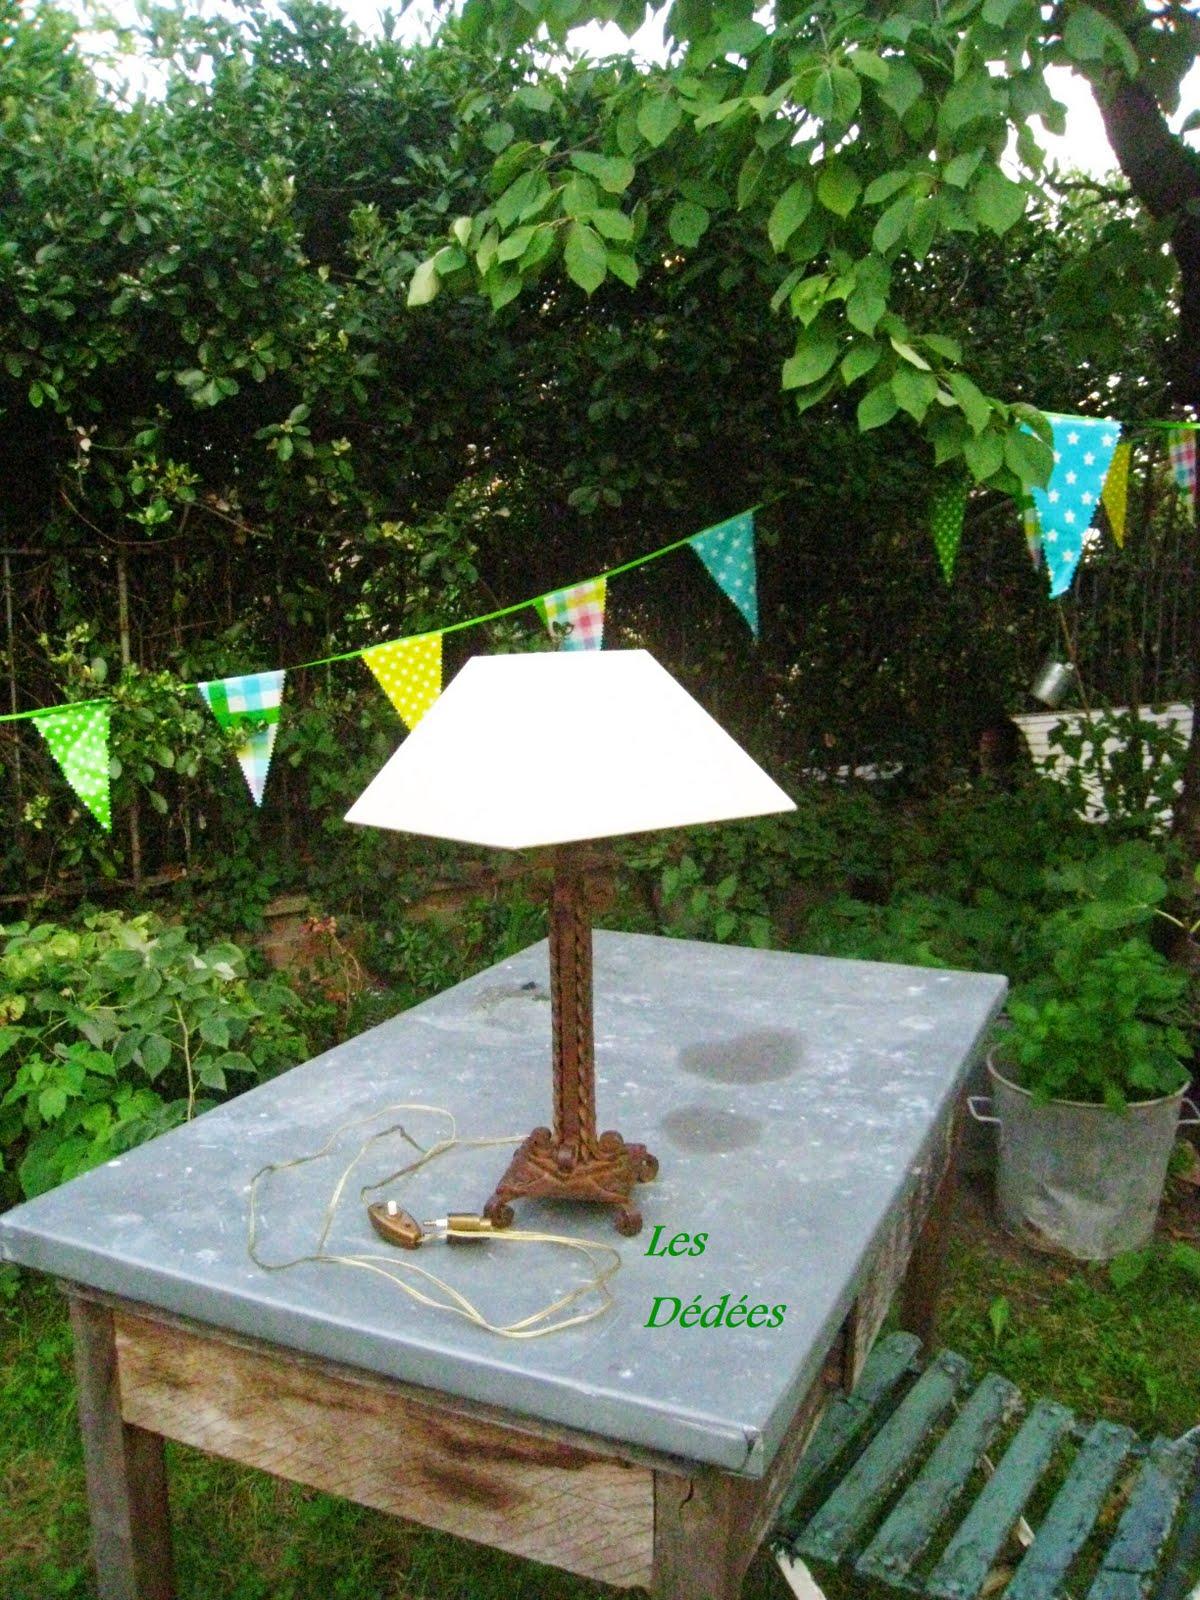 "Les dedees vintage recup creations LAMPE FER FORGE ""RECUP"